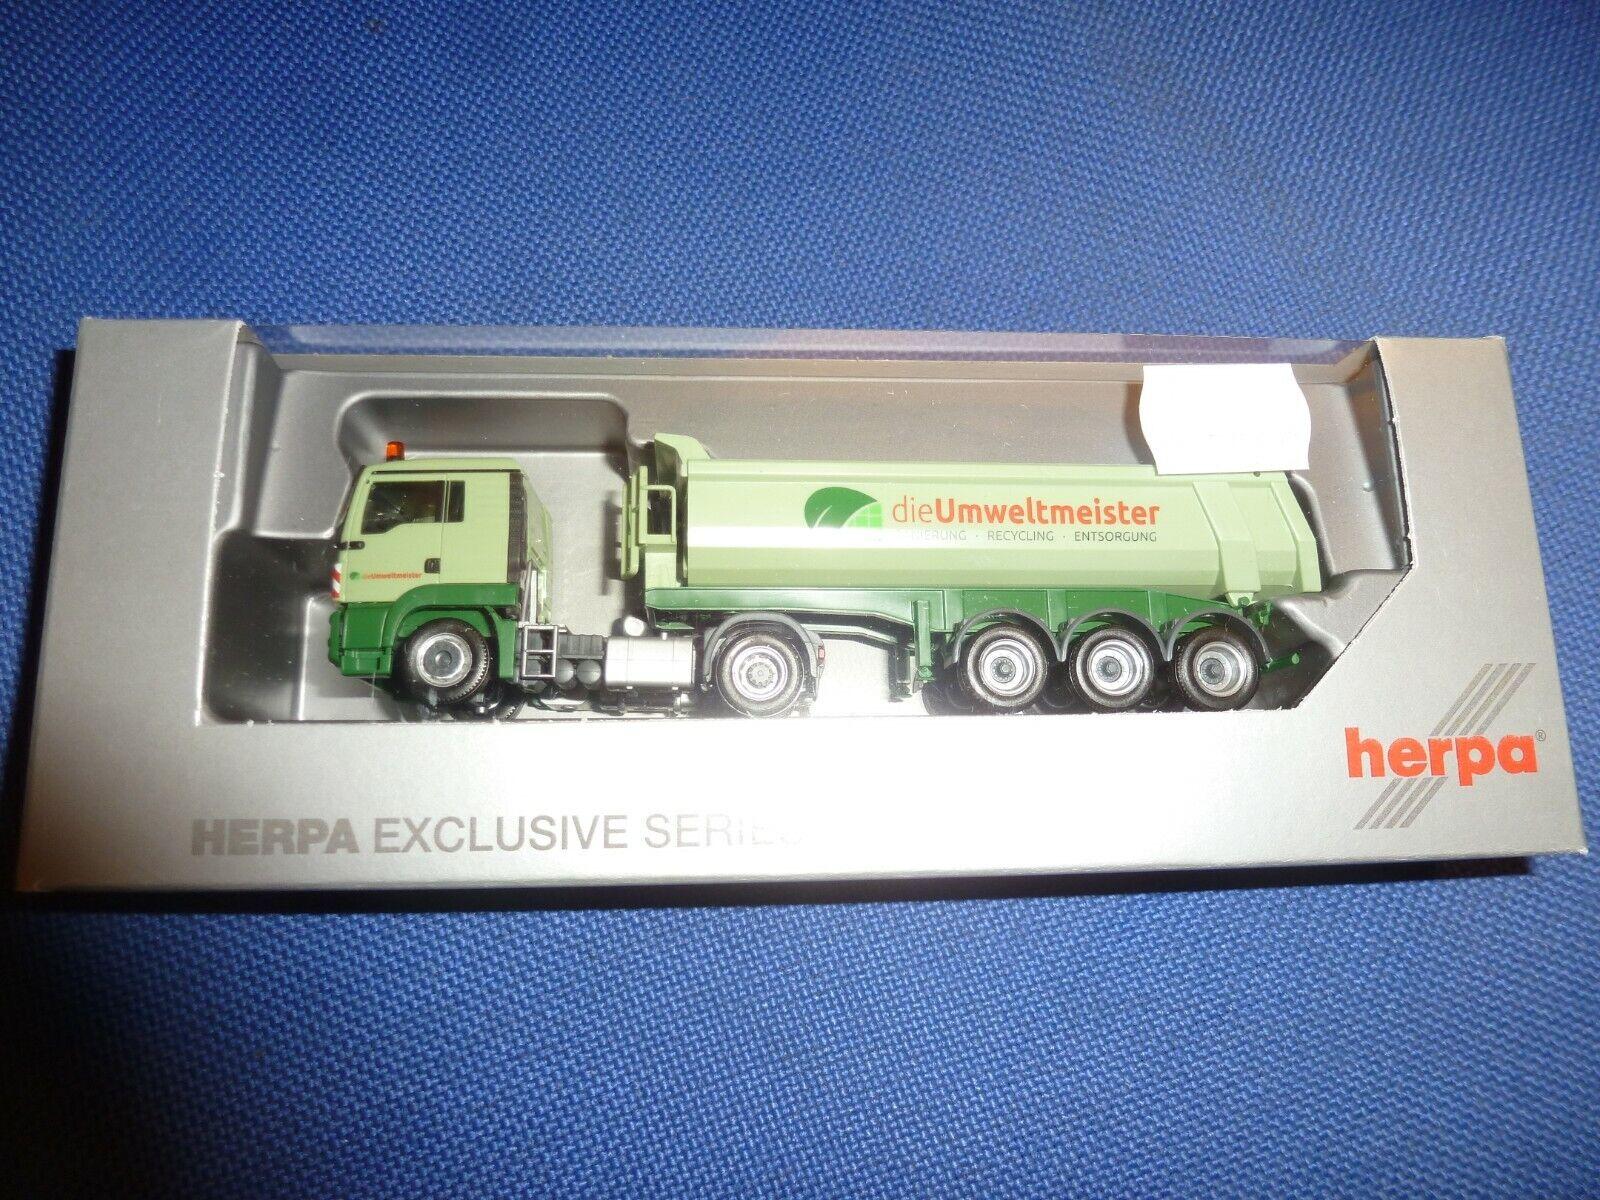 Kühl-KSZ Heide Logistik 121996 Herpa LKW MAN TG-X XXL Aerop